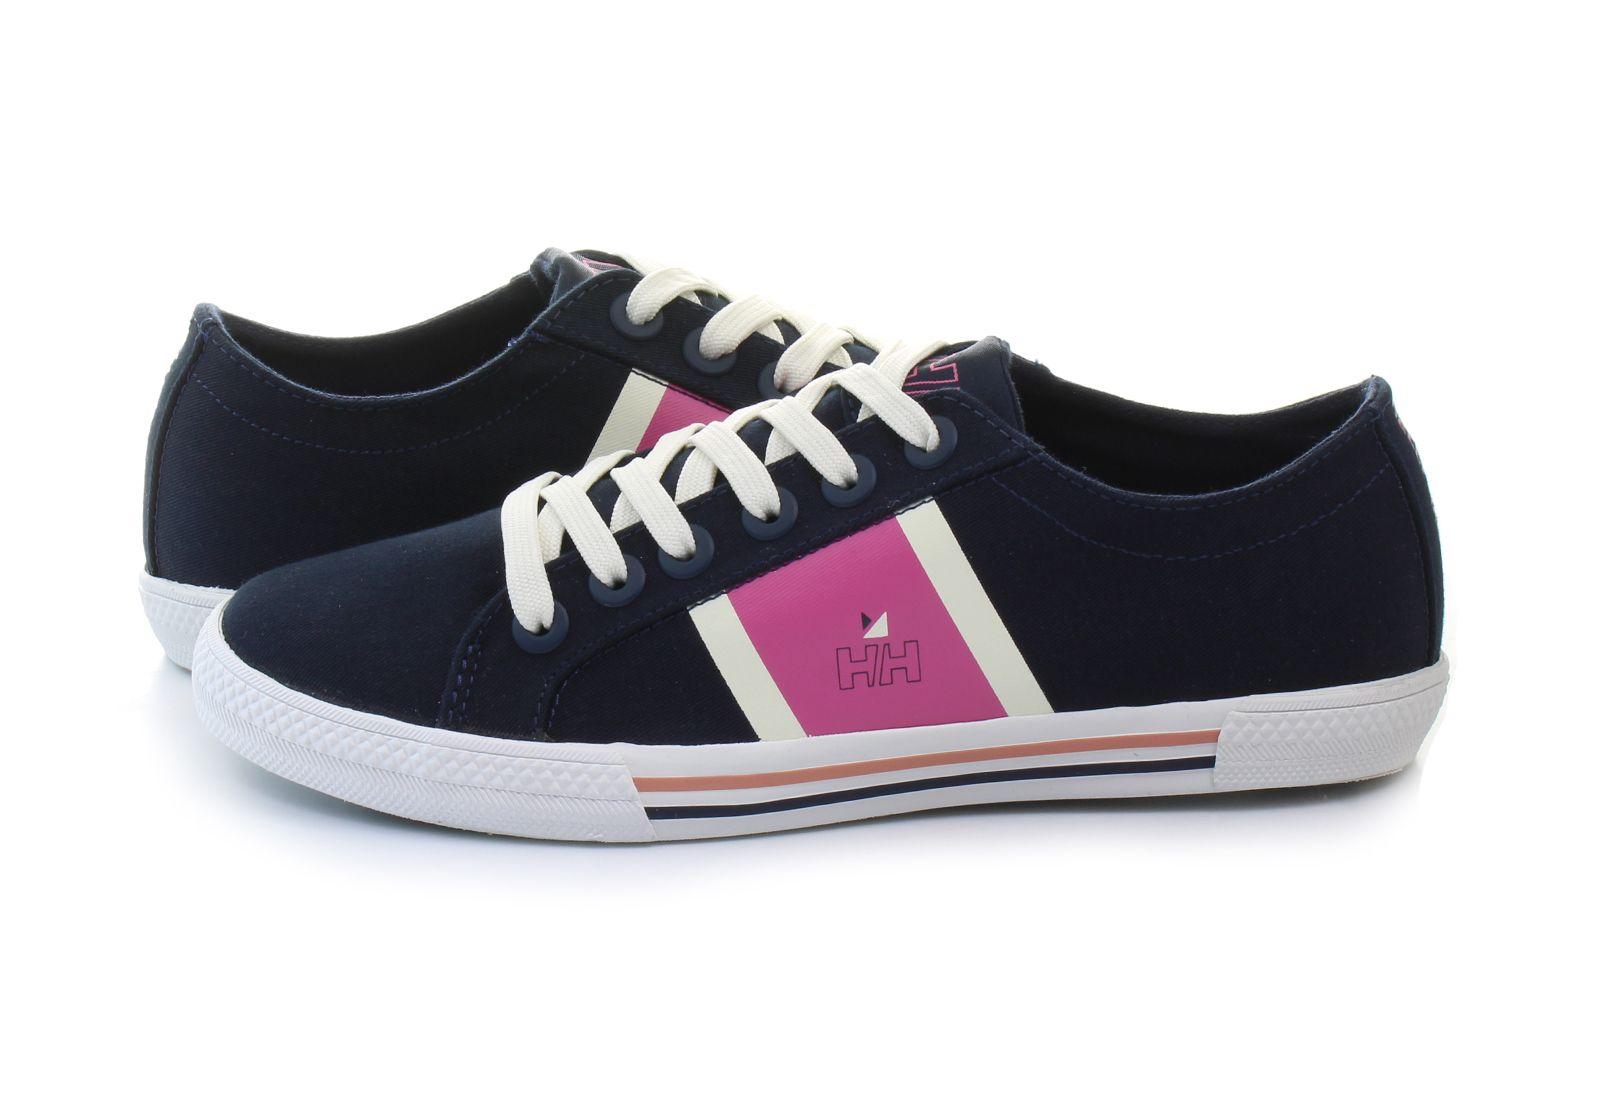 Helly Hansen HELLY HANSEN BERGE VIKING LOW női utcai cipő